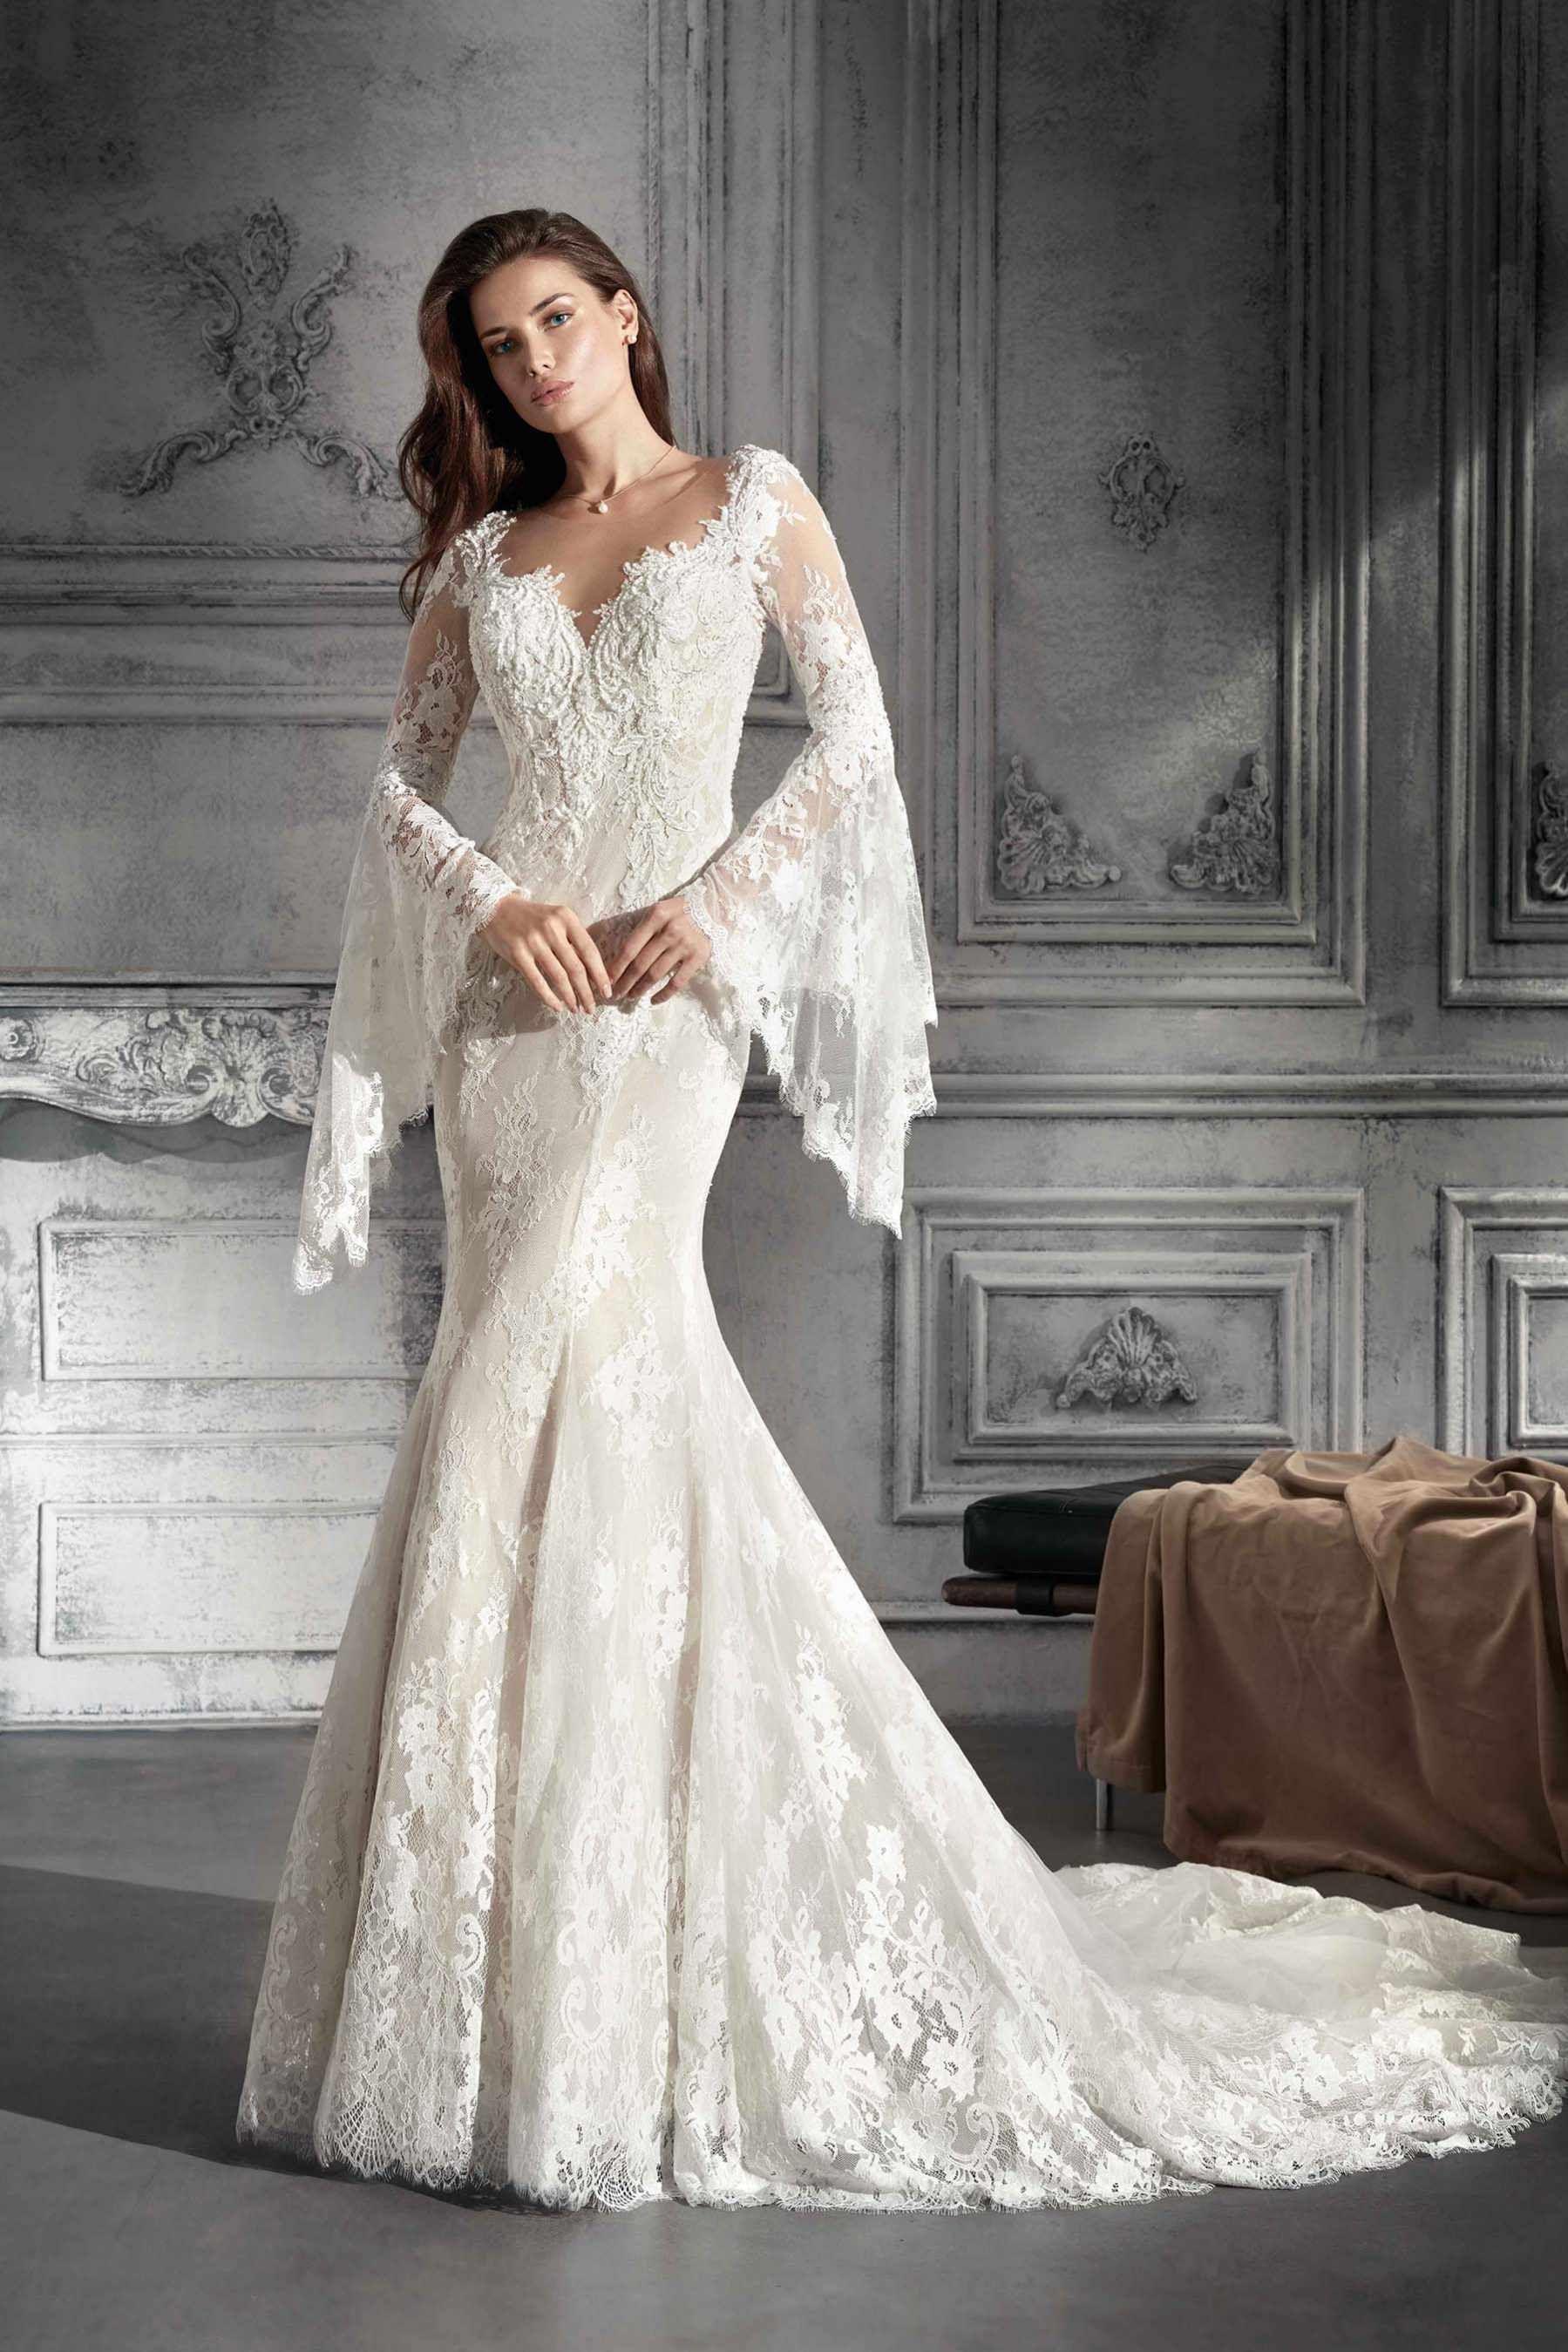 Demetrios wedding dress style vow renewal pinterest